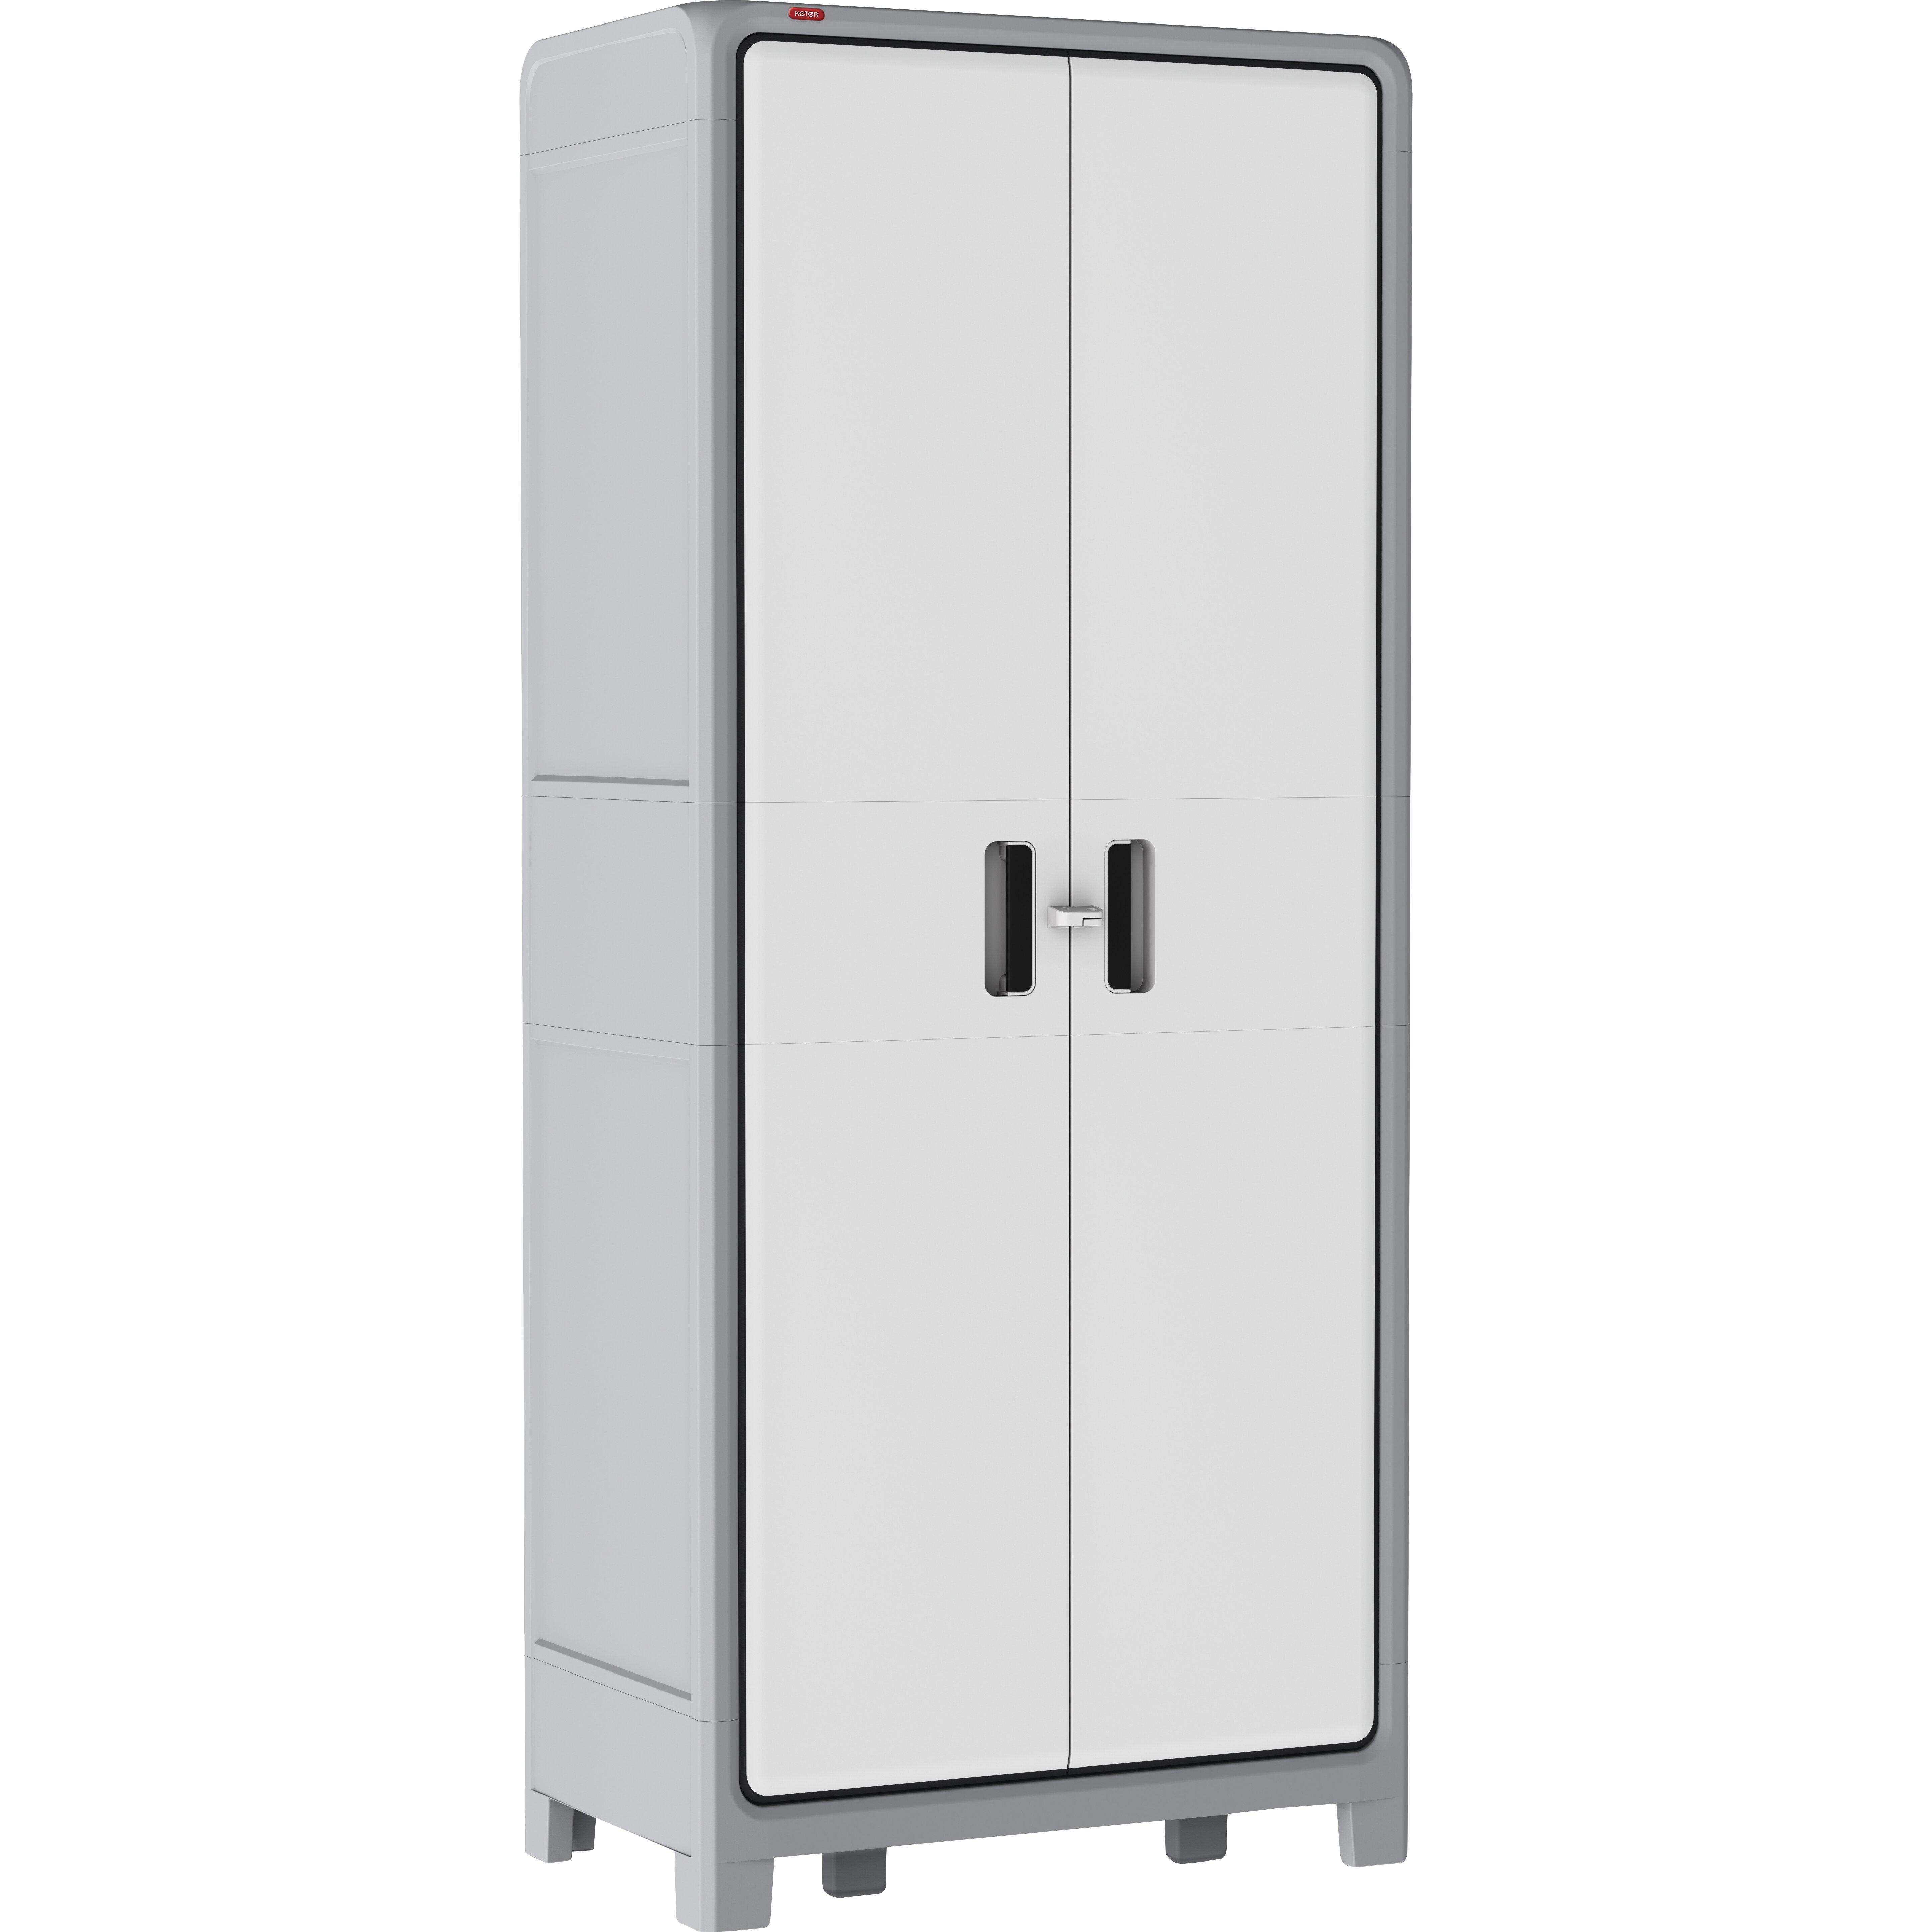 18 Storage Cabinet Optima Wonder Plastic 72 H X 31 W X 18 D Storage Cabinet